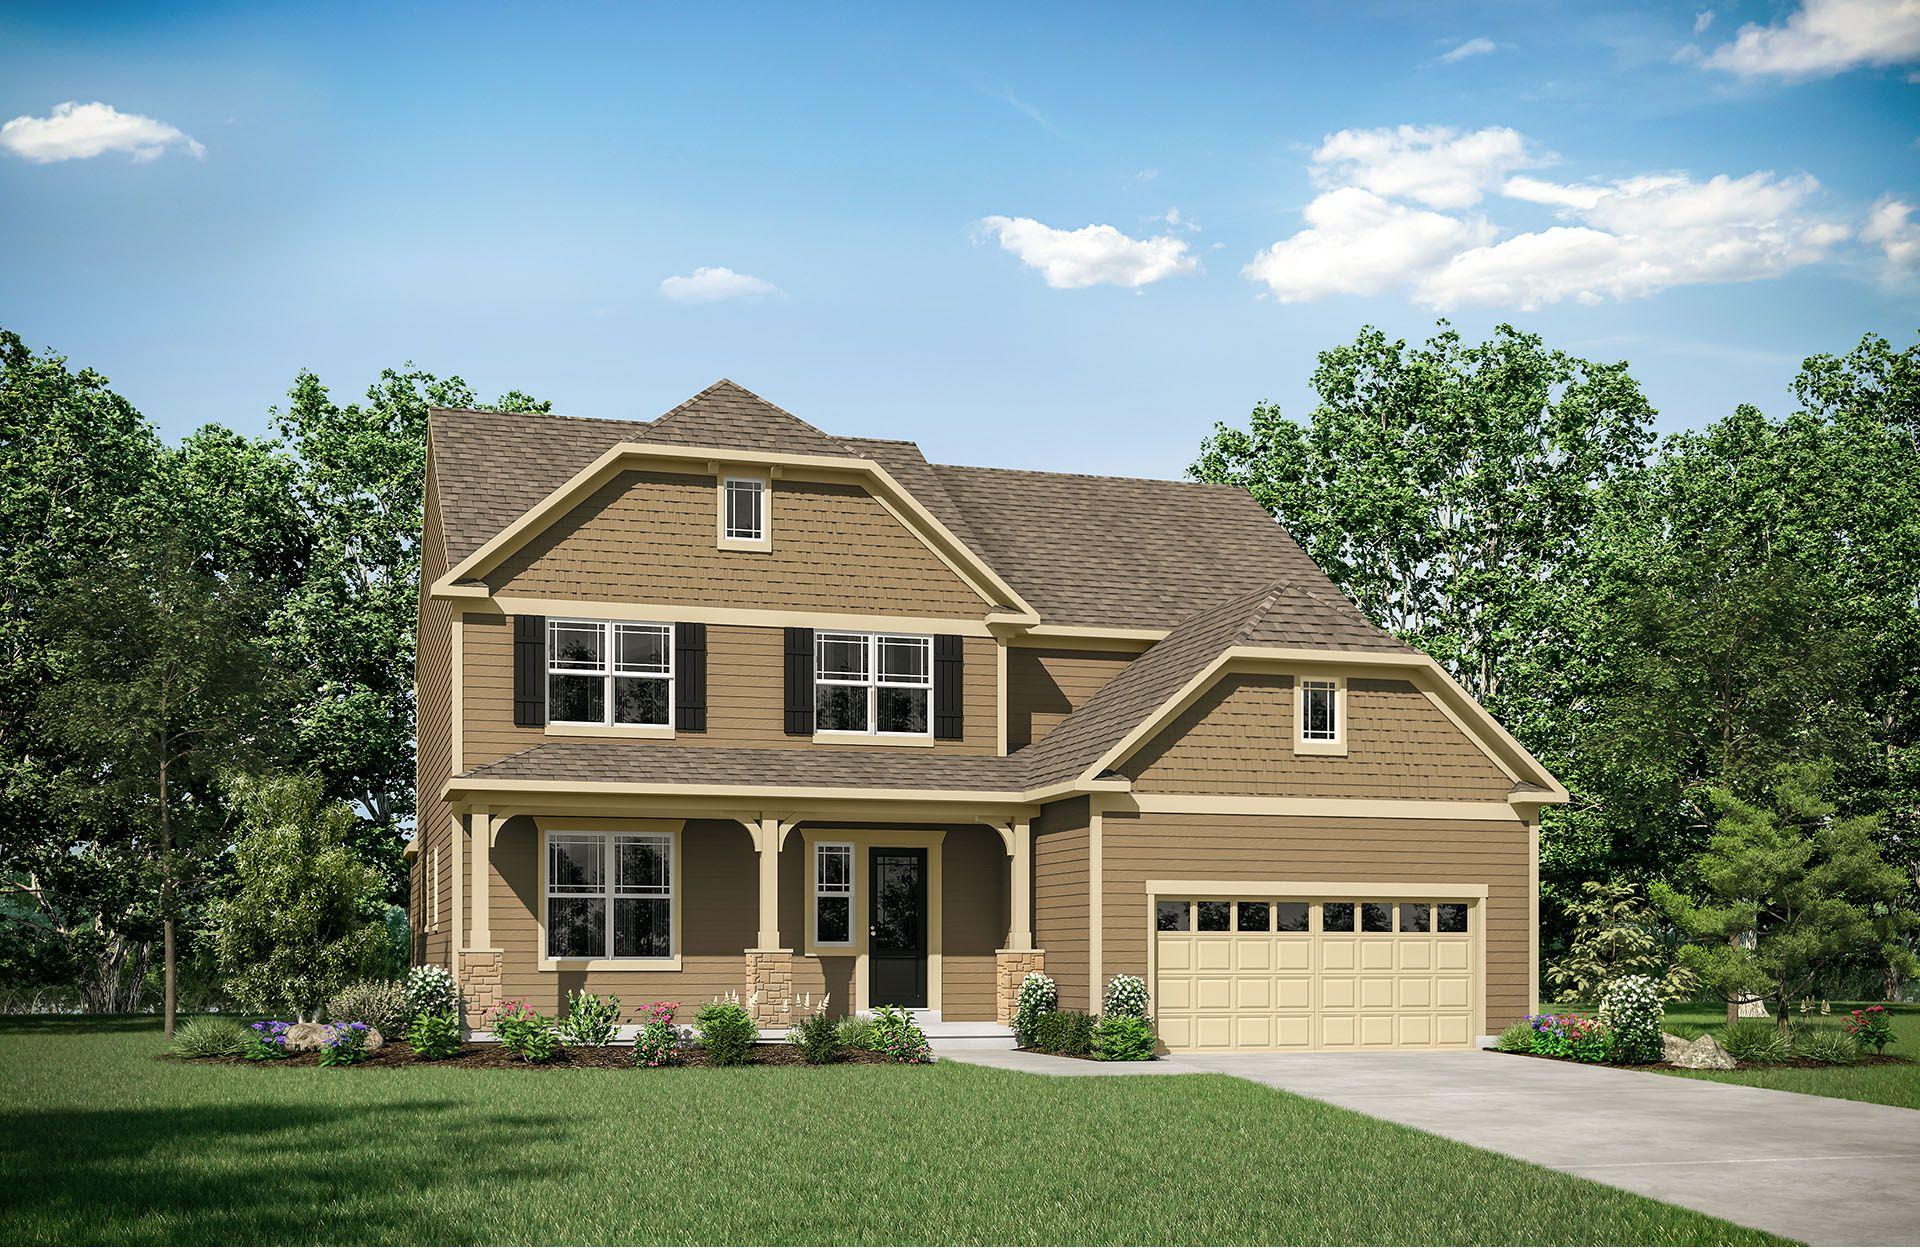 158 Edgewater Drive, Fredericksburg, VA Homes & Land - Real Estate